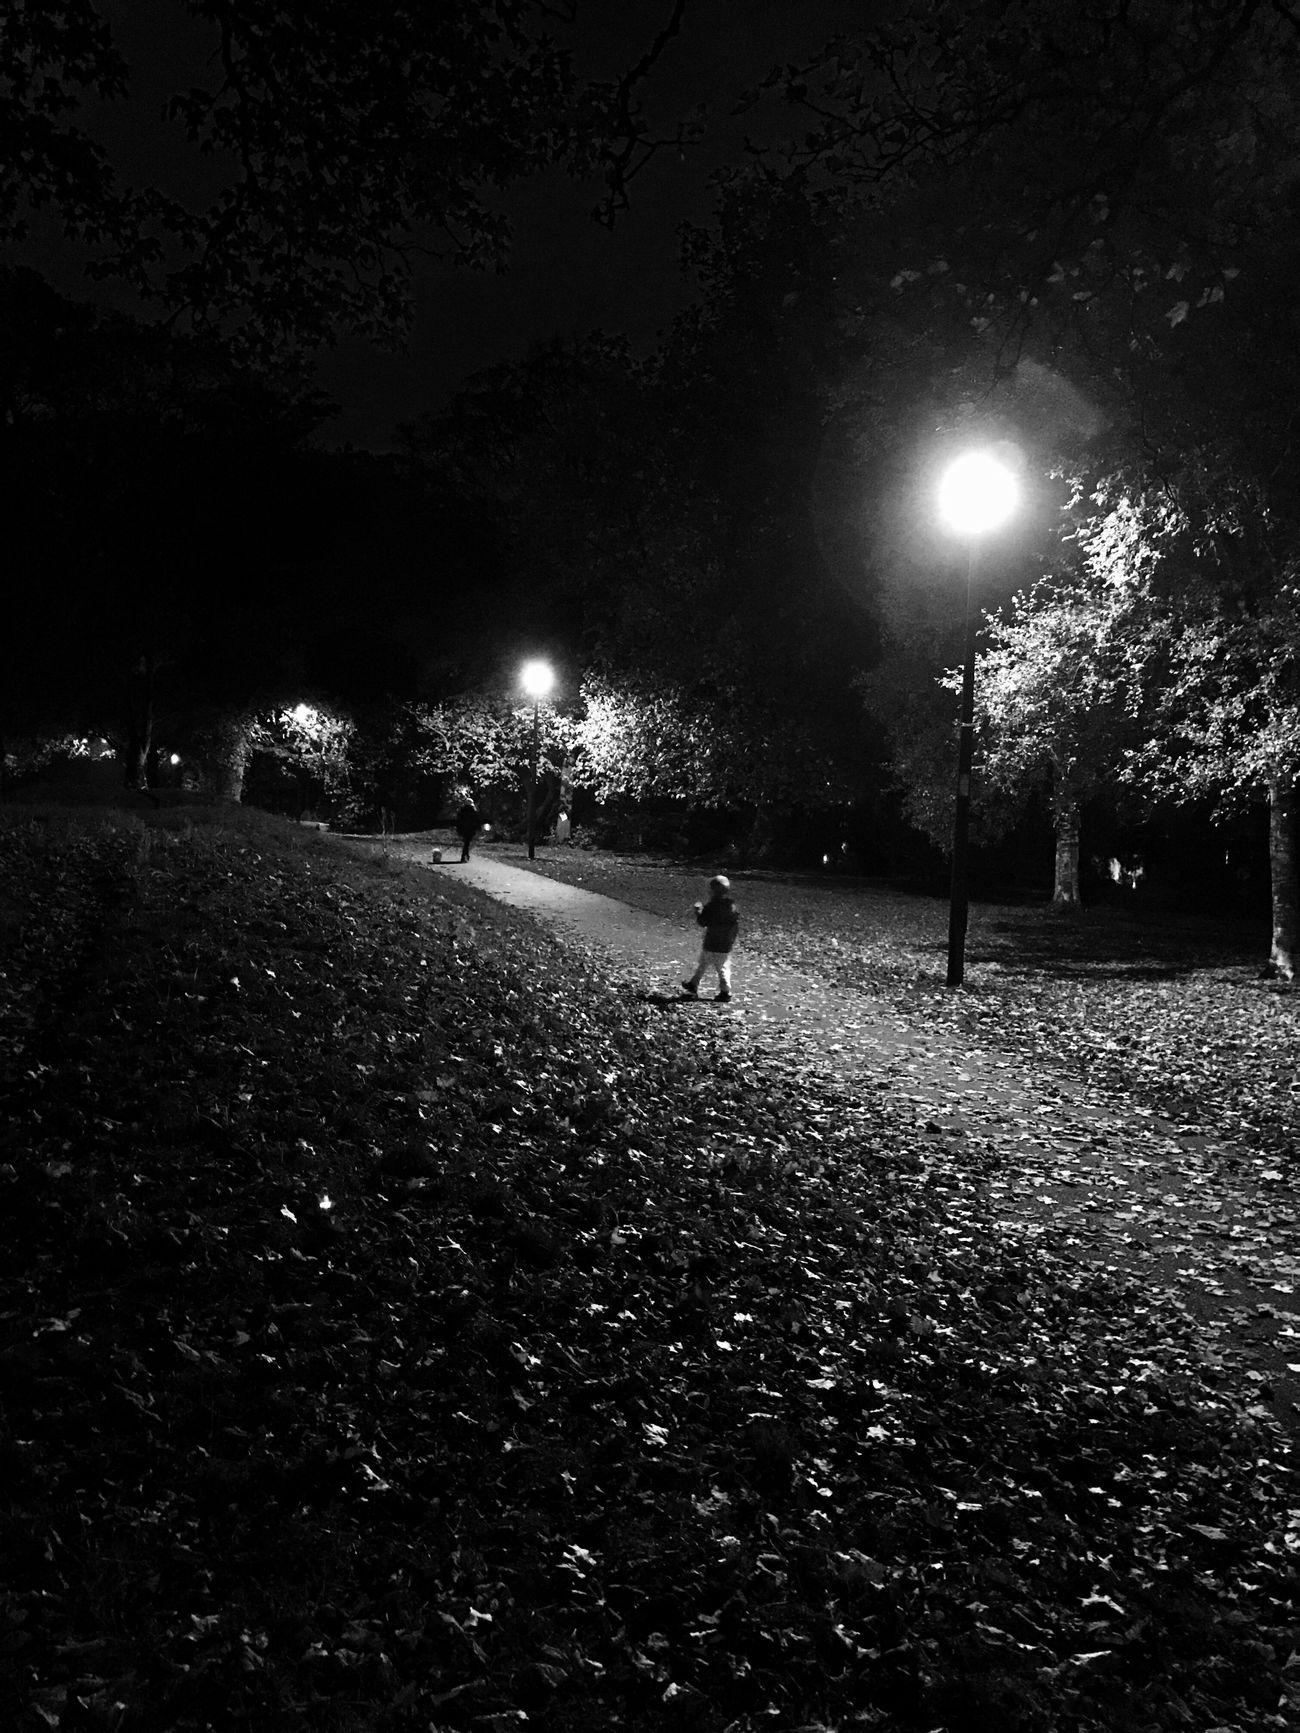 Night Illuminated Outdoors Lifestyles black Black & White Blackandwhite Blackandwhite Photography Black And White Blackandwhitephotography